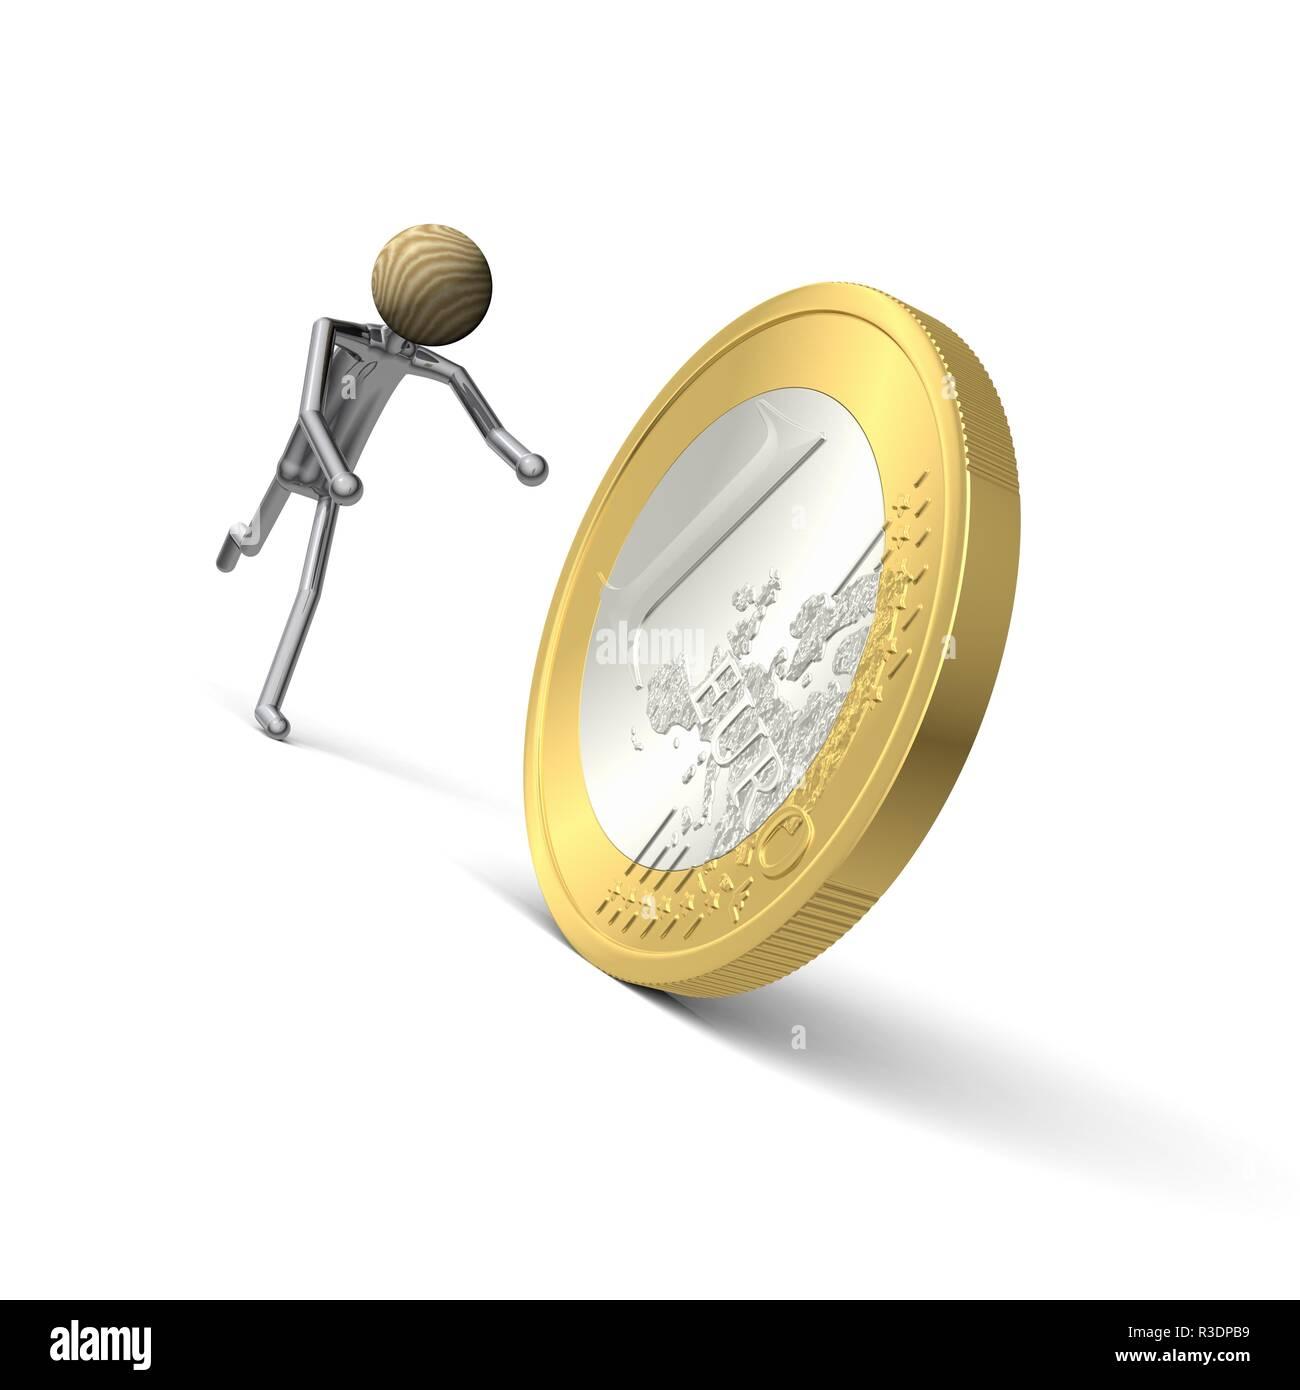 behind the money running here 2 - Stock Image